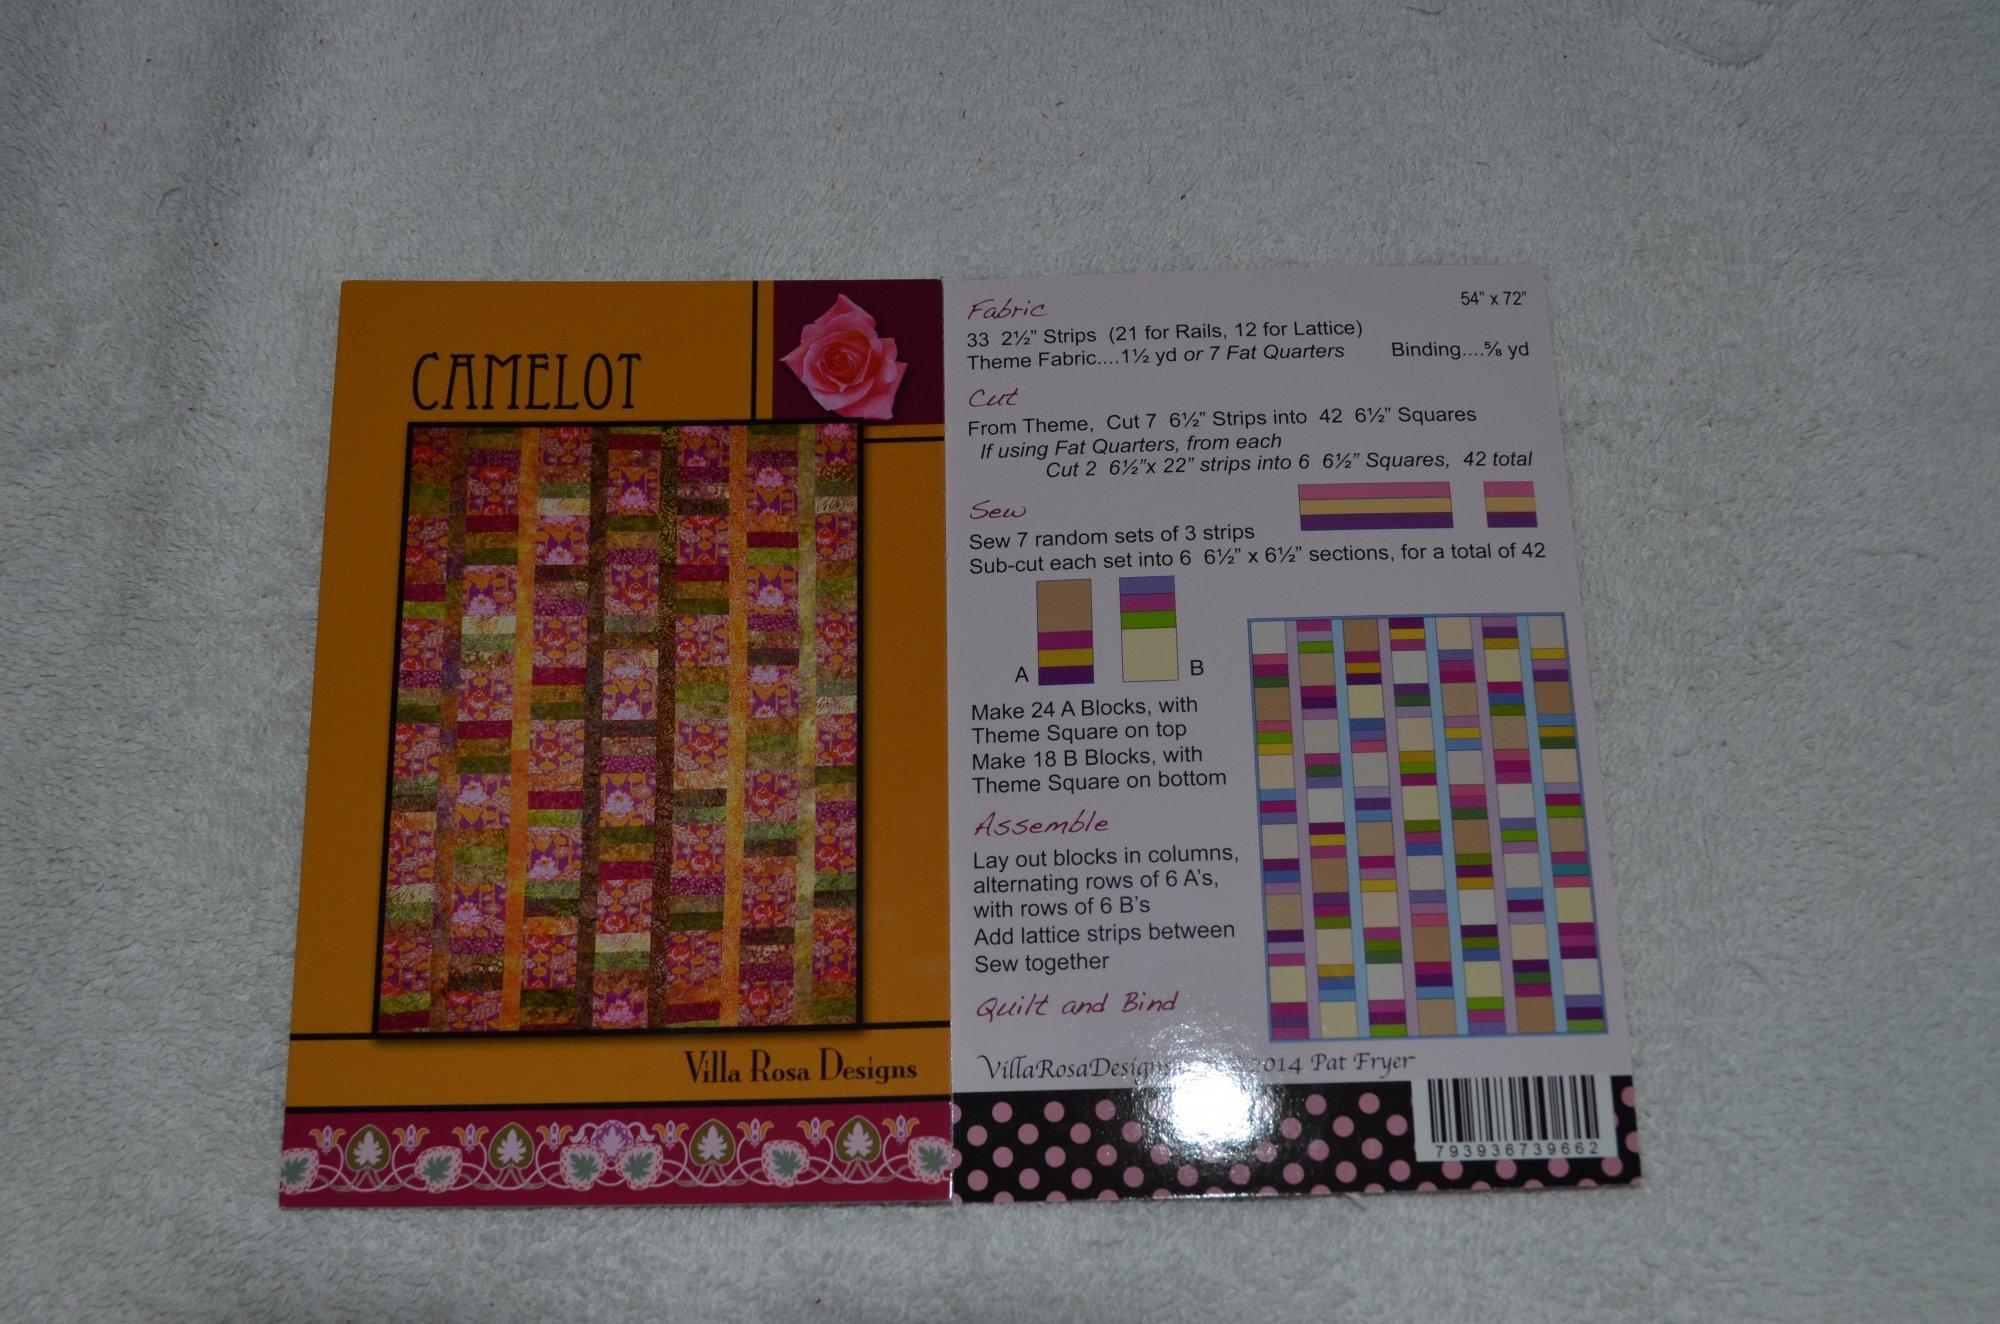 Camelot Pattern VRD739662C by Villa Rosa Designs